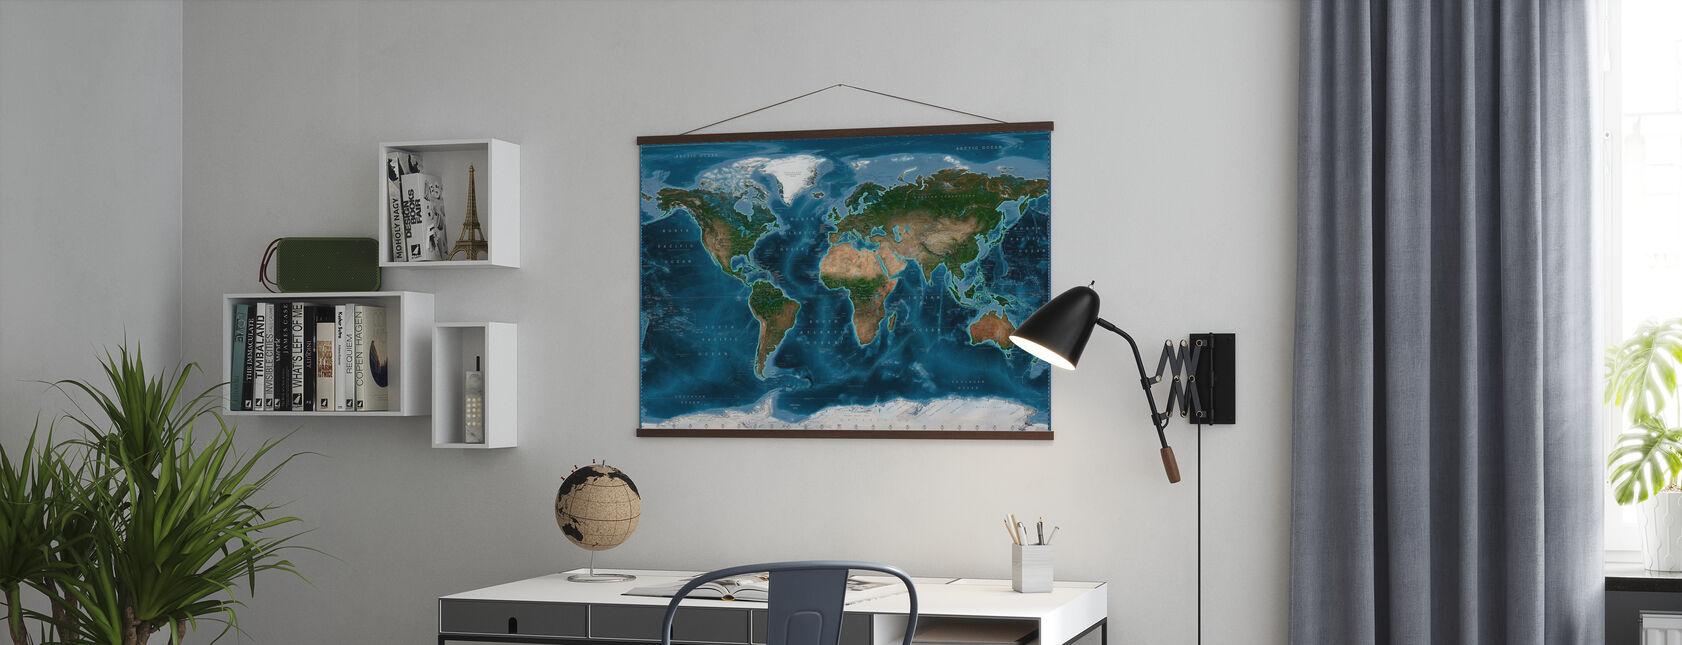 Satelite Karta - Poster - Kontor